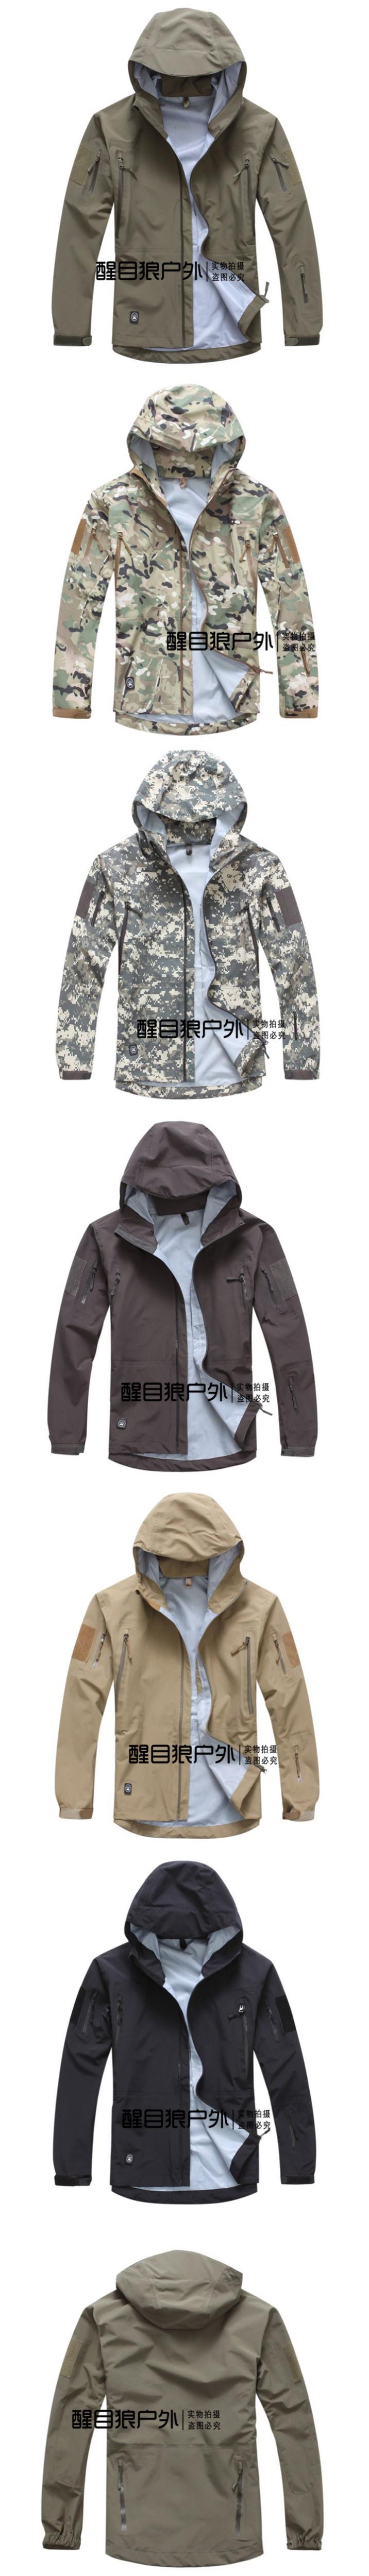 Raptor Hard sharkskin Jackets Jackets outdoor wind and waterproof rain jacket